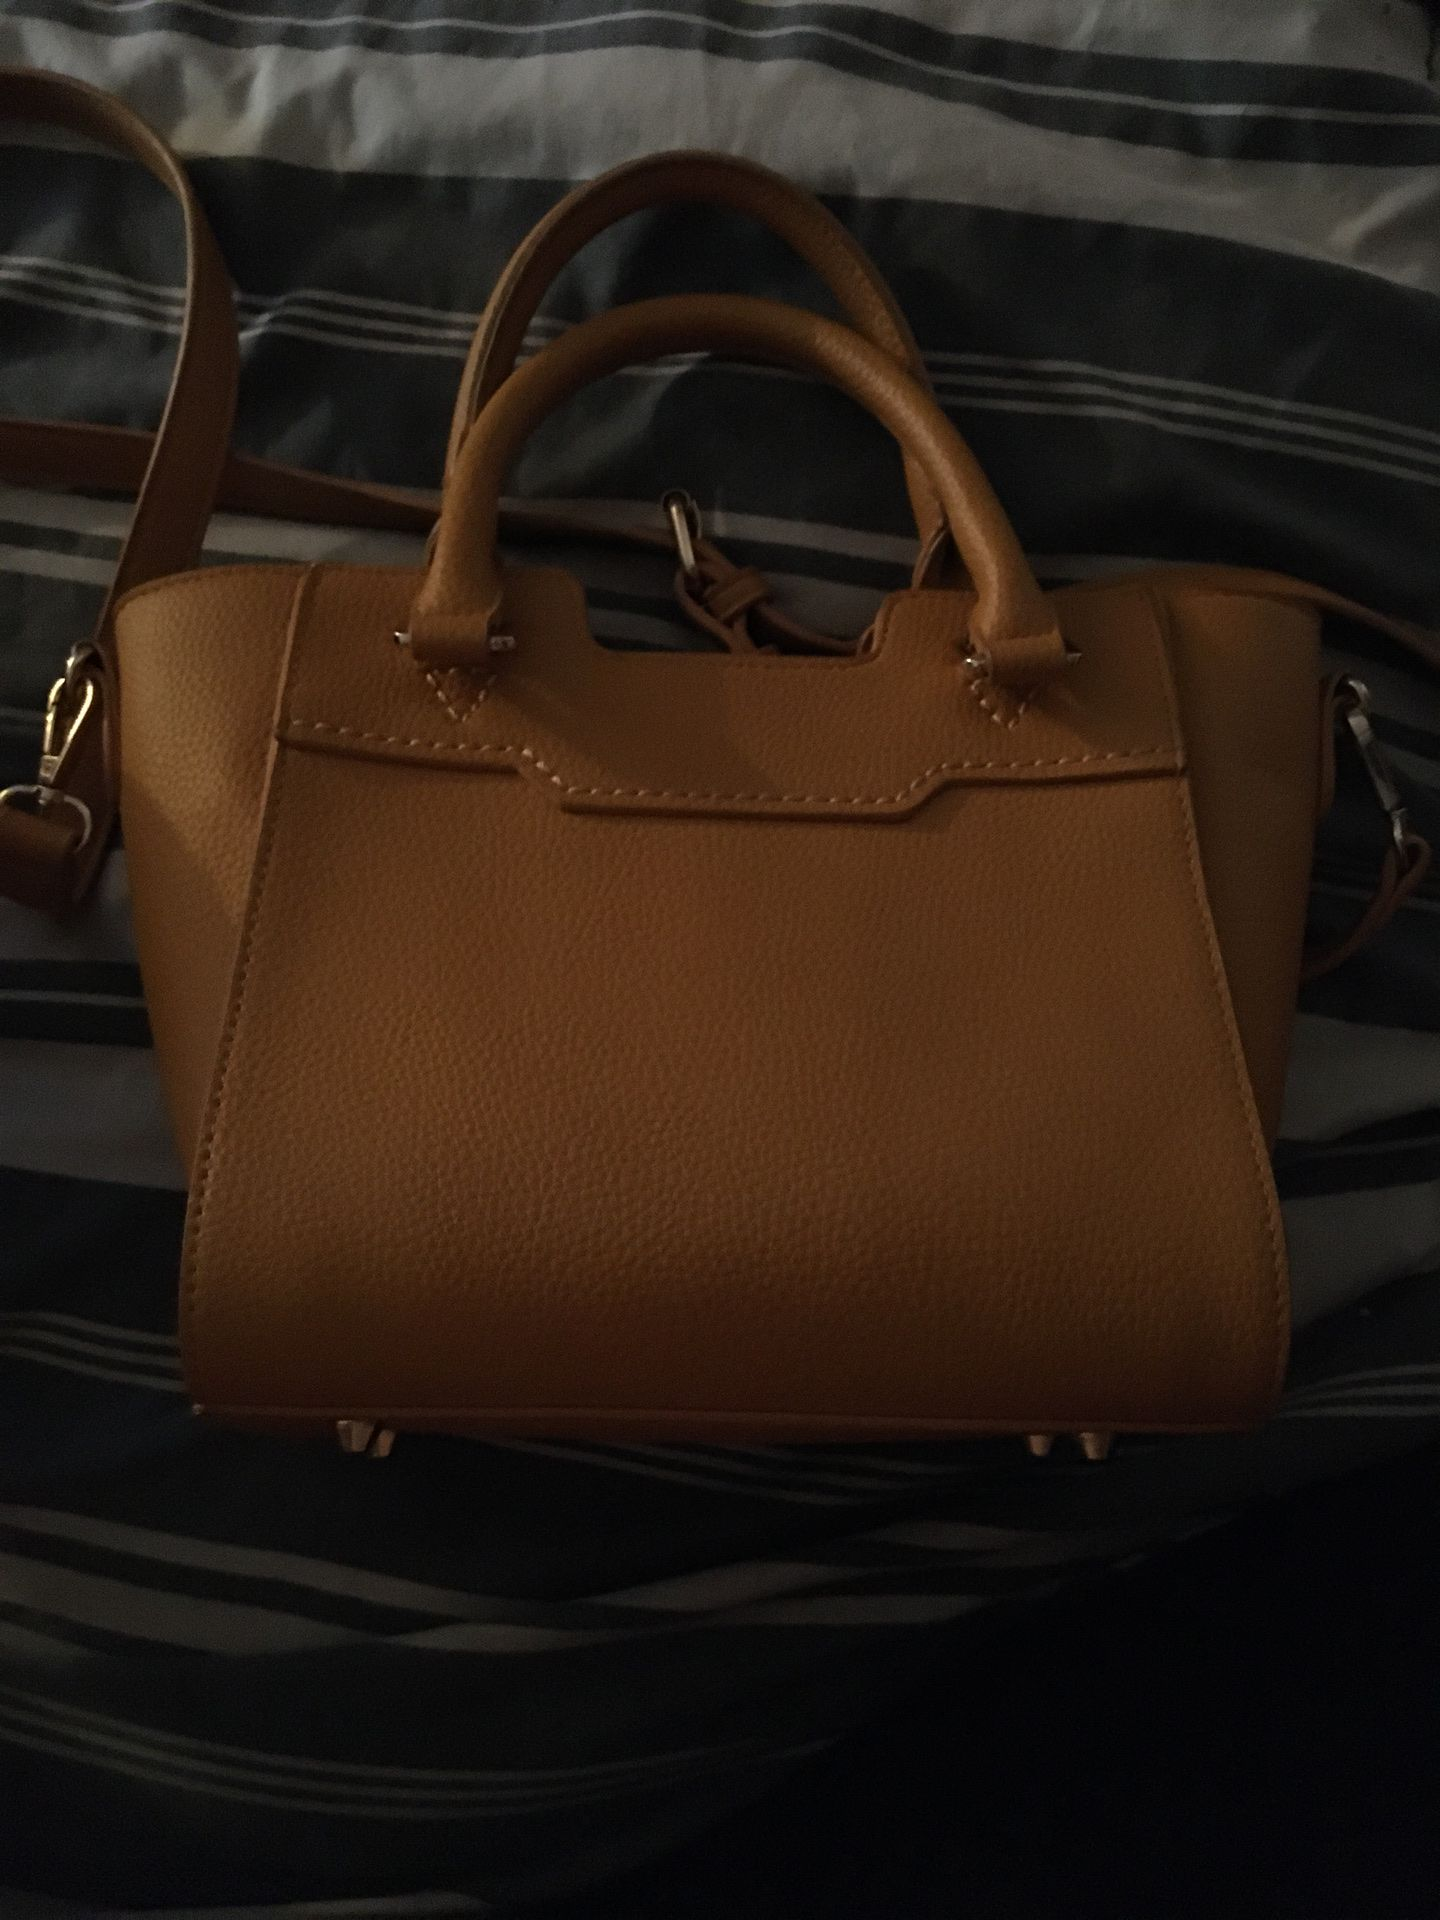 Mustard color purse